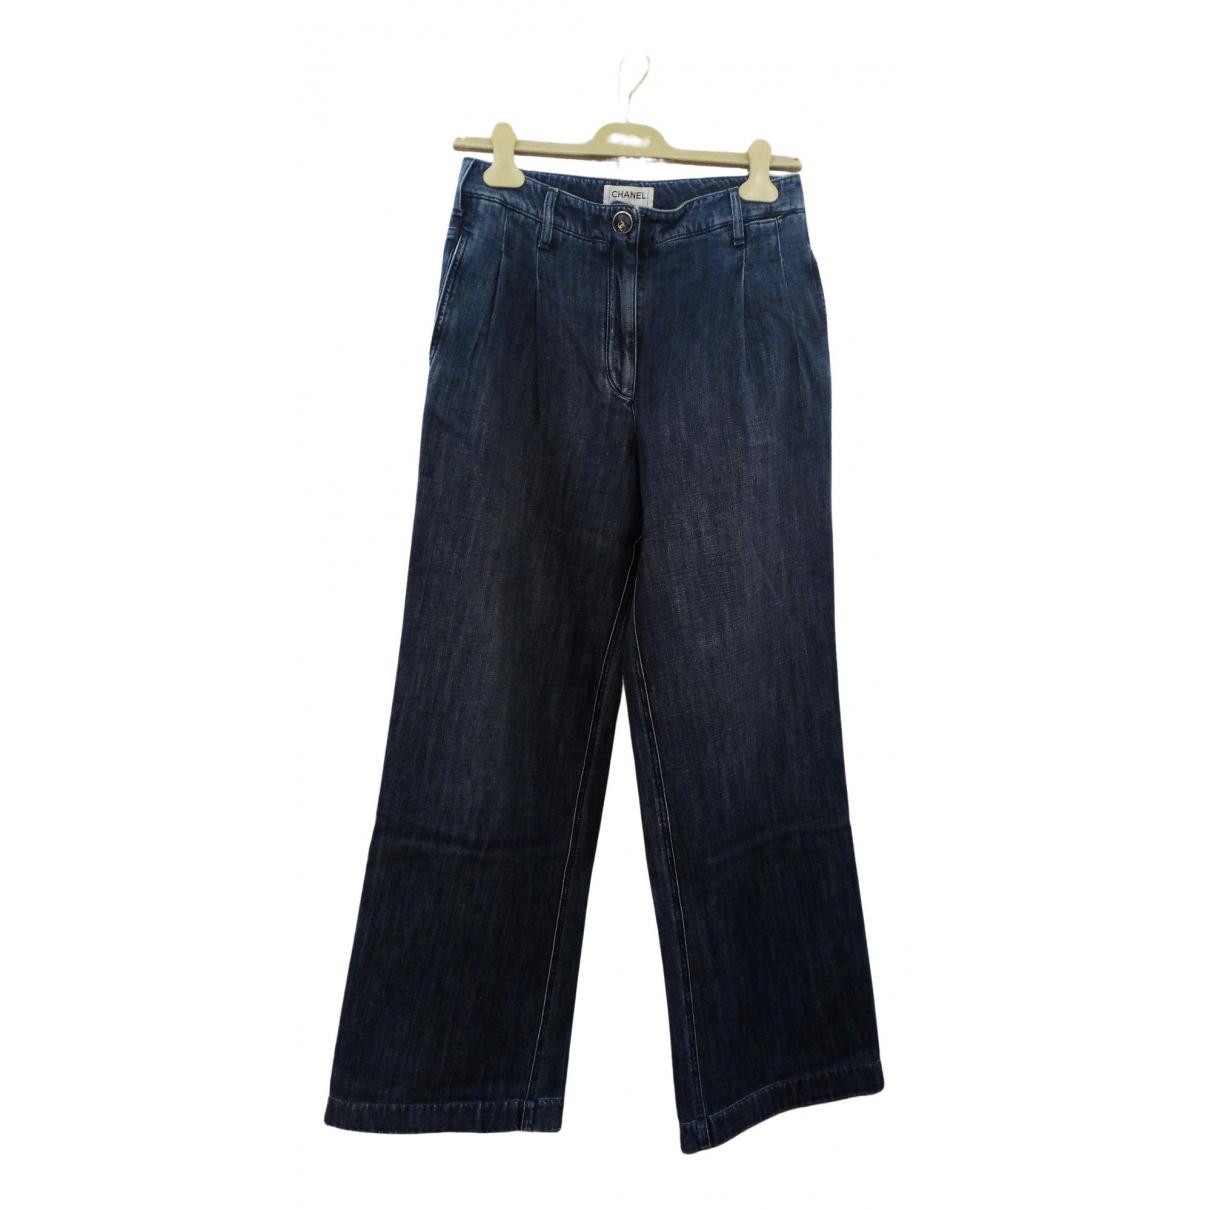 Chanel \N Blue Denim - Jeans Trousers for Women 38 FR